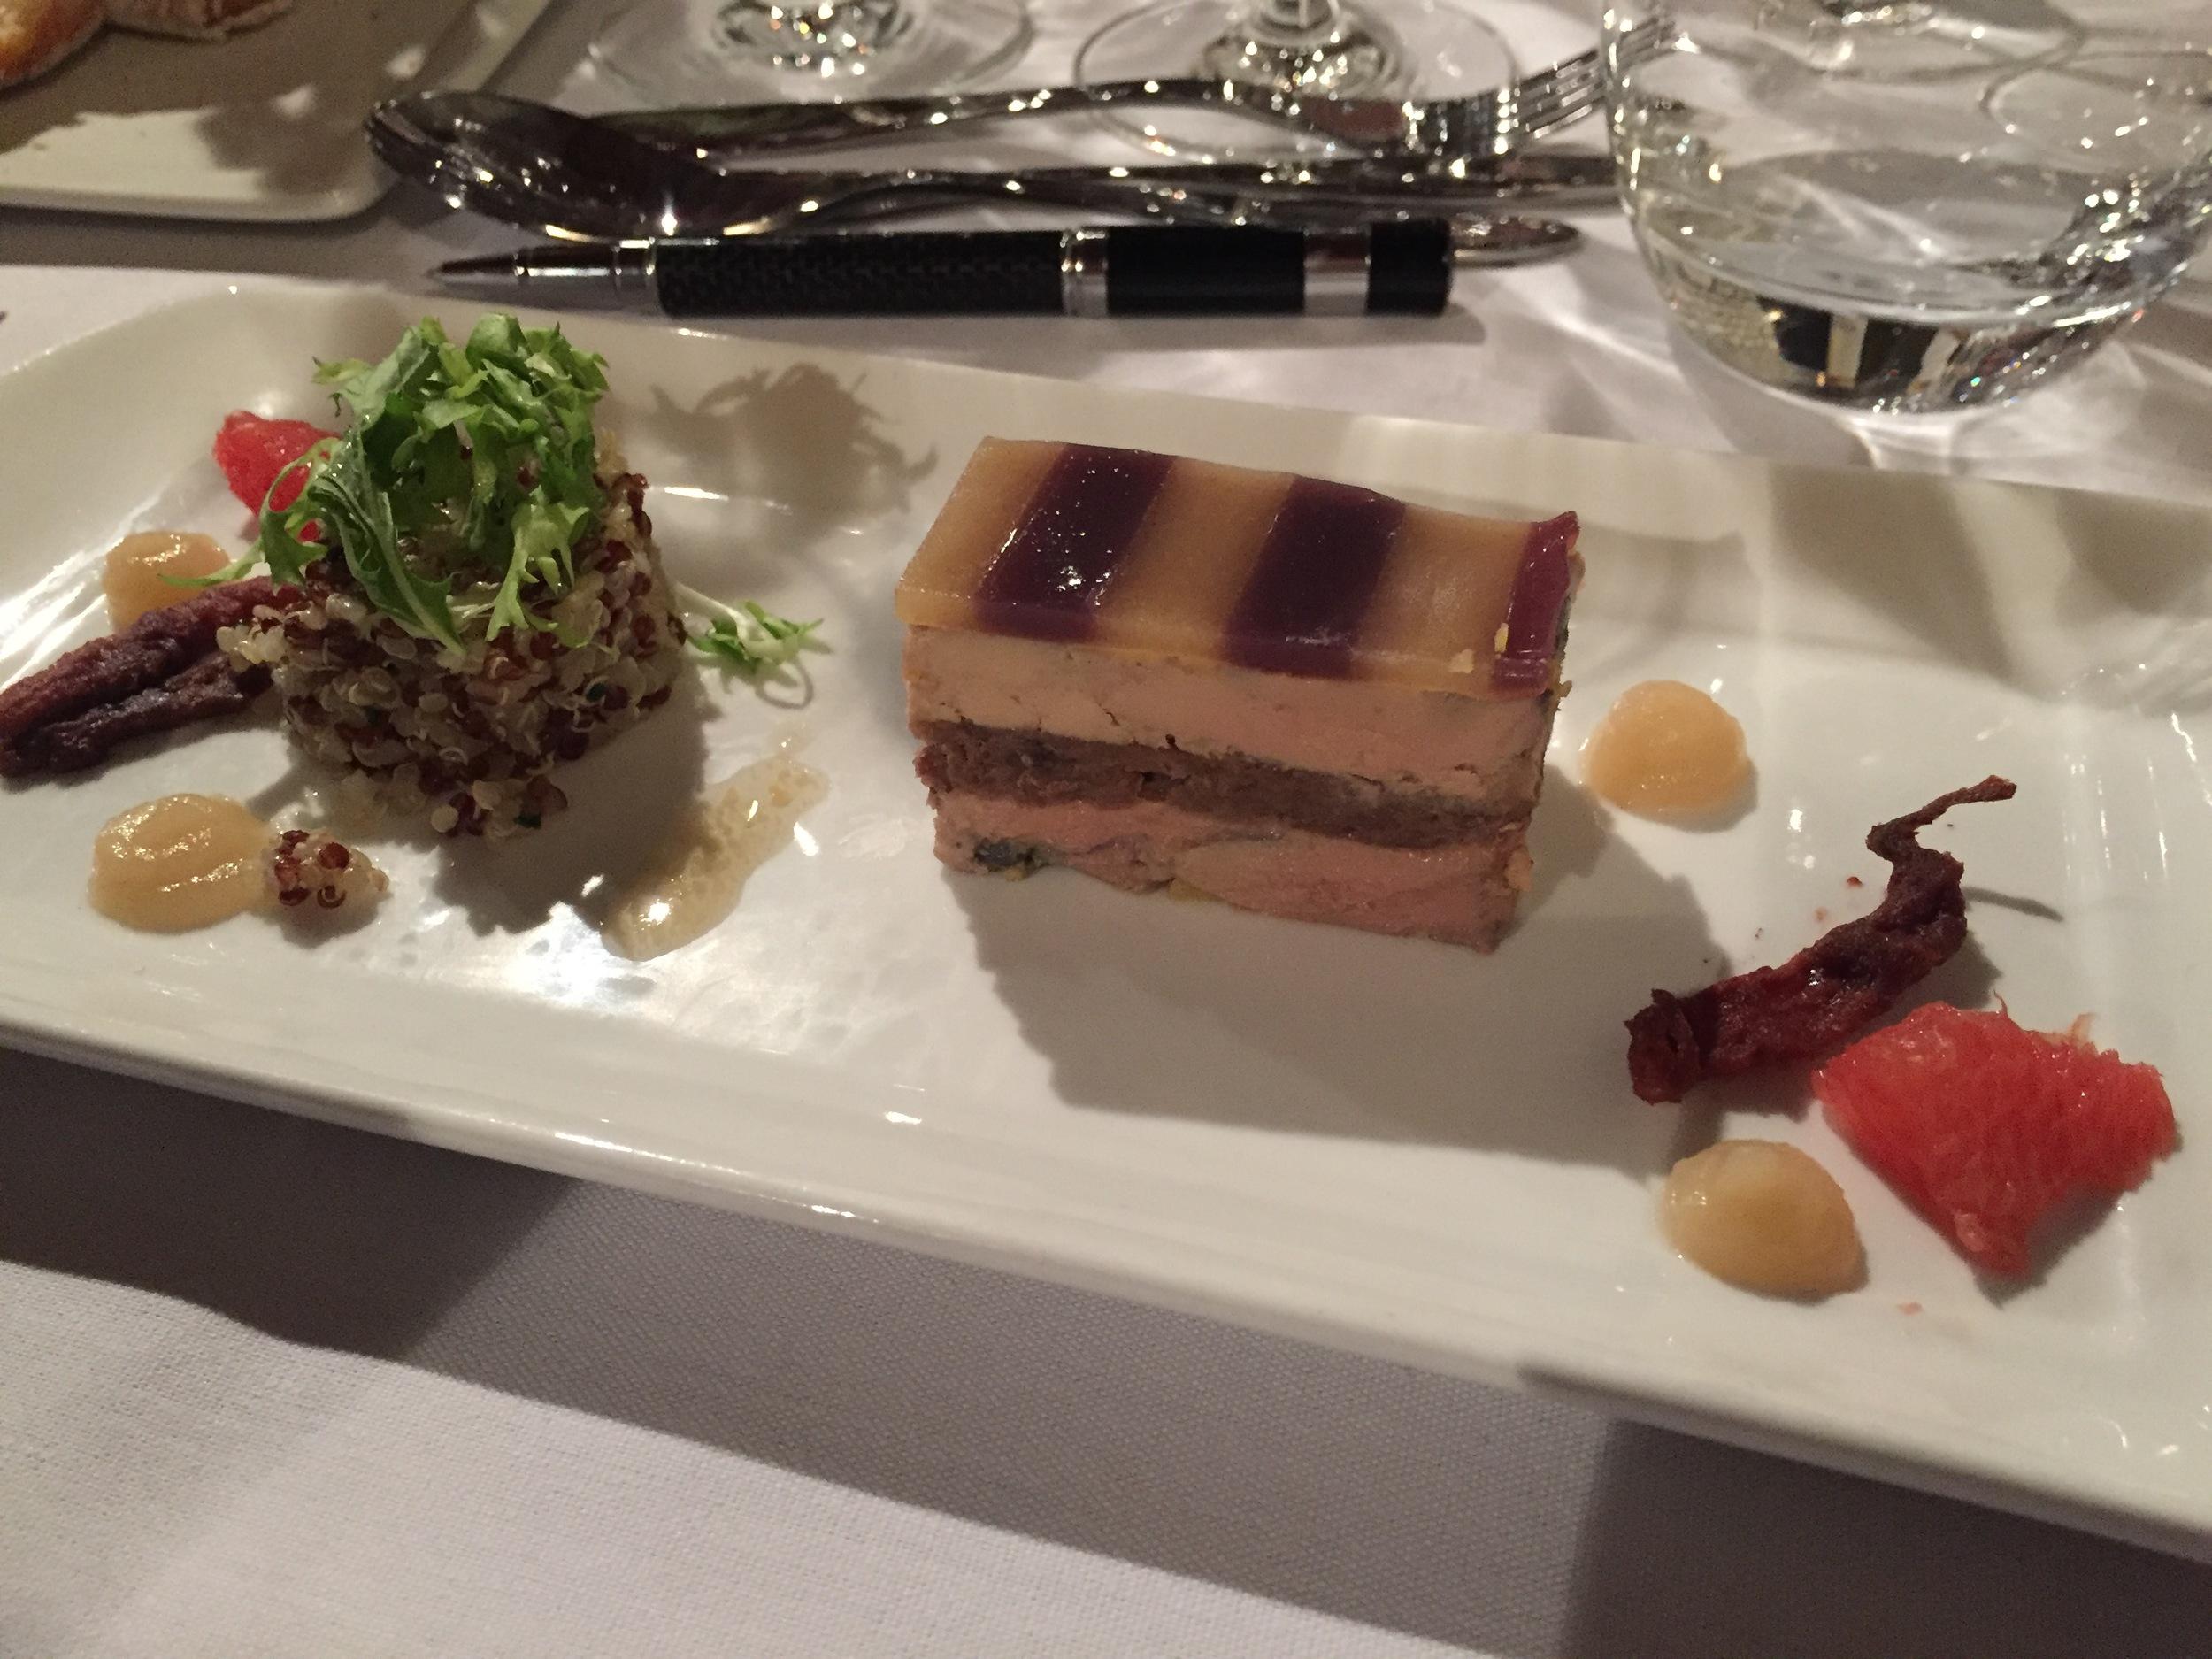 A little foie gras, for starters